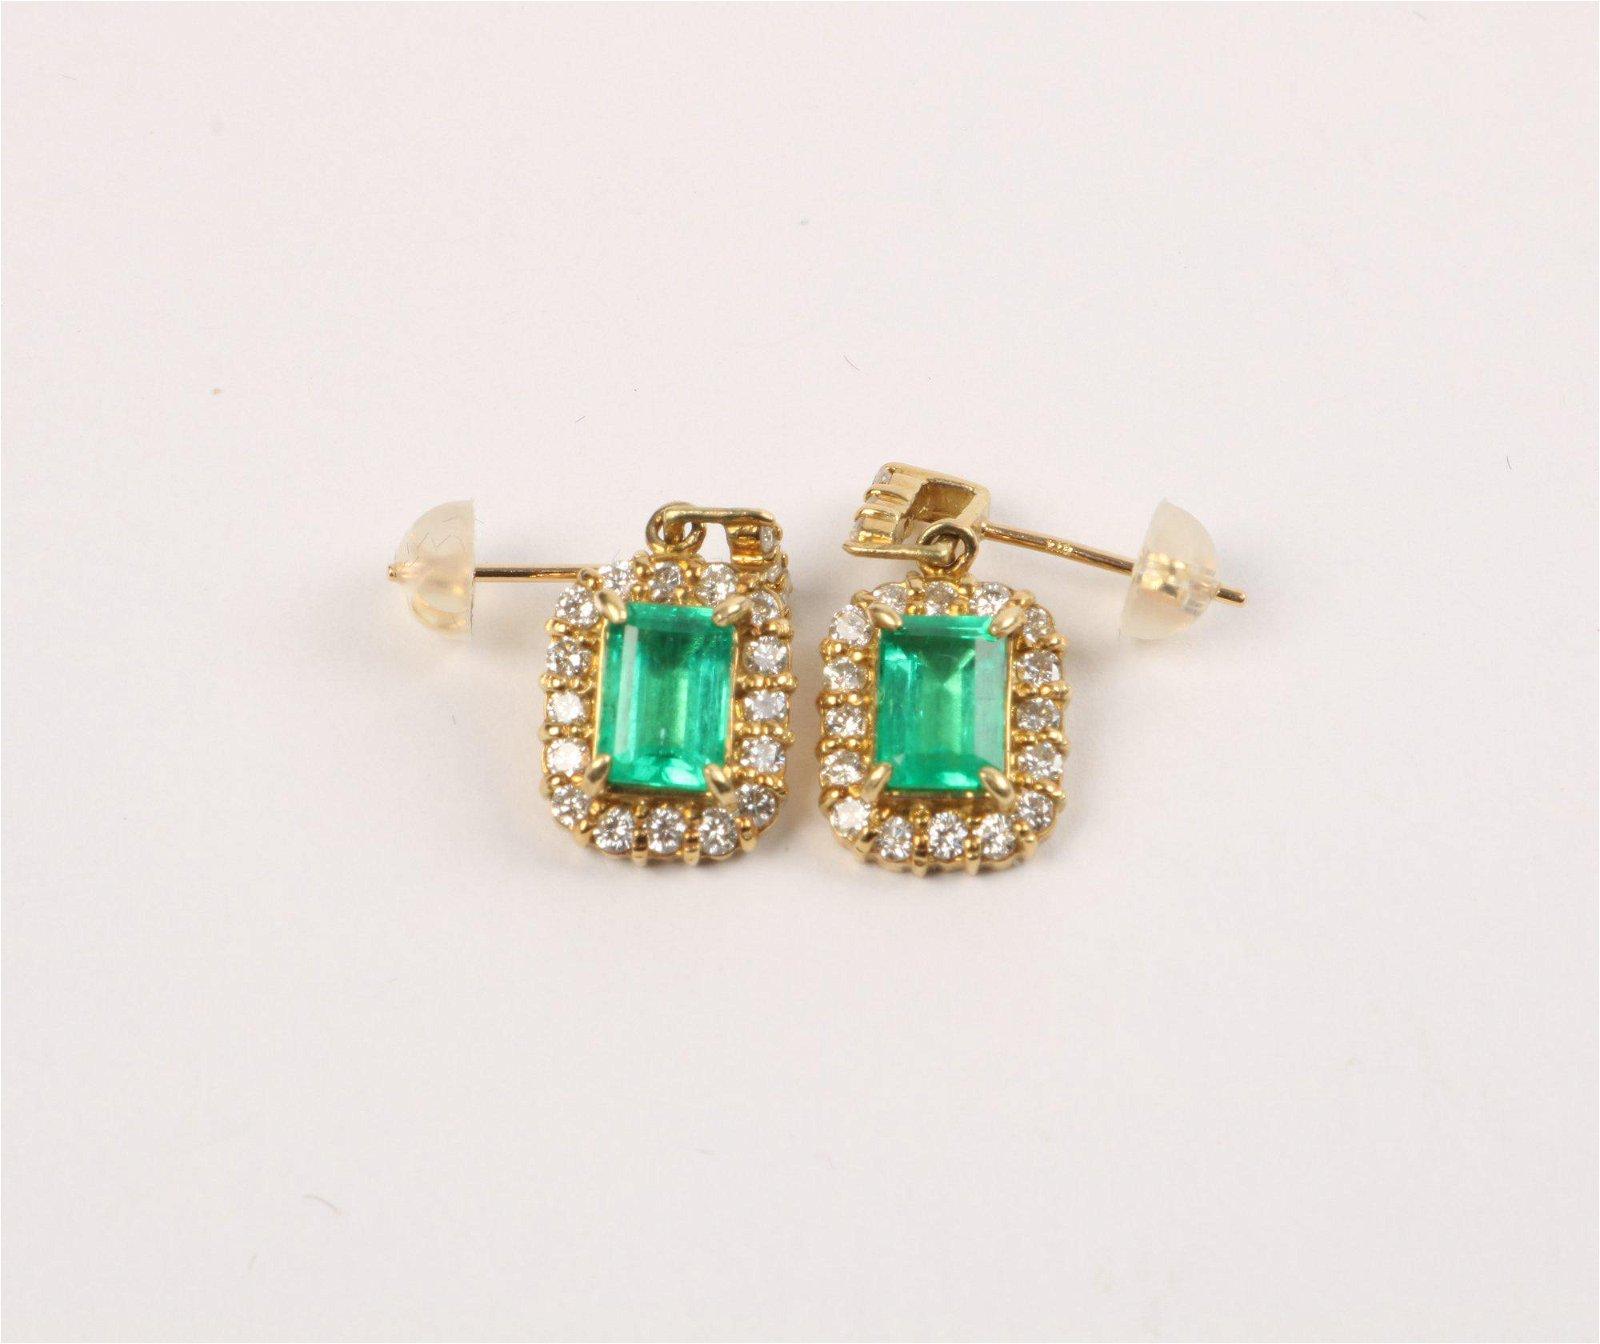 A Pair Of 18K gold, emerald & Diamond Earrings